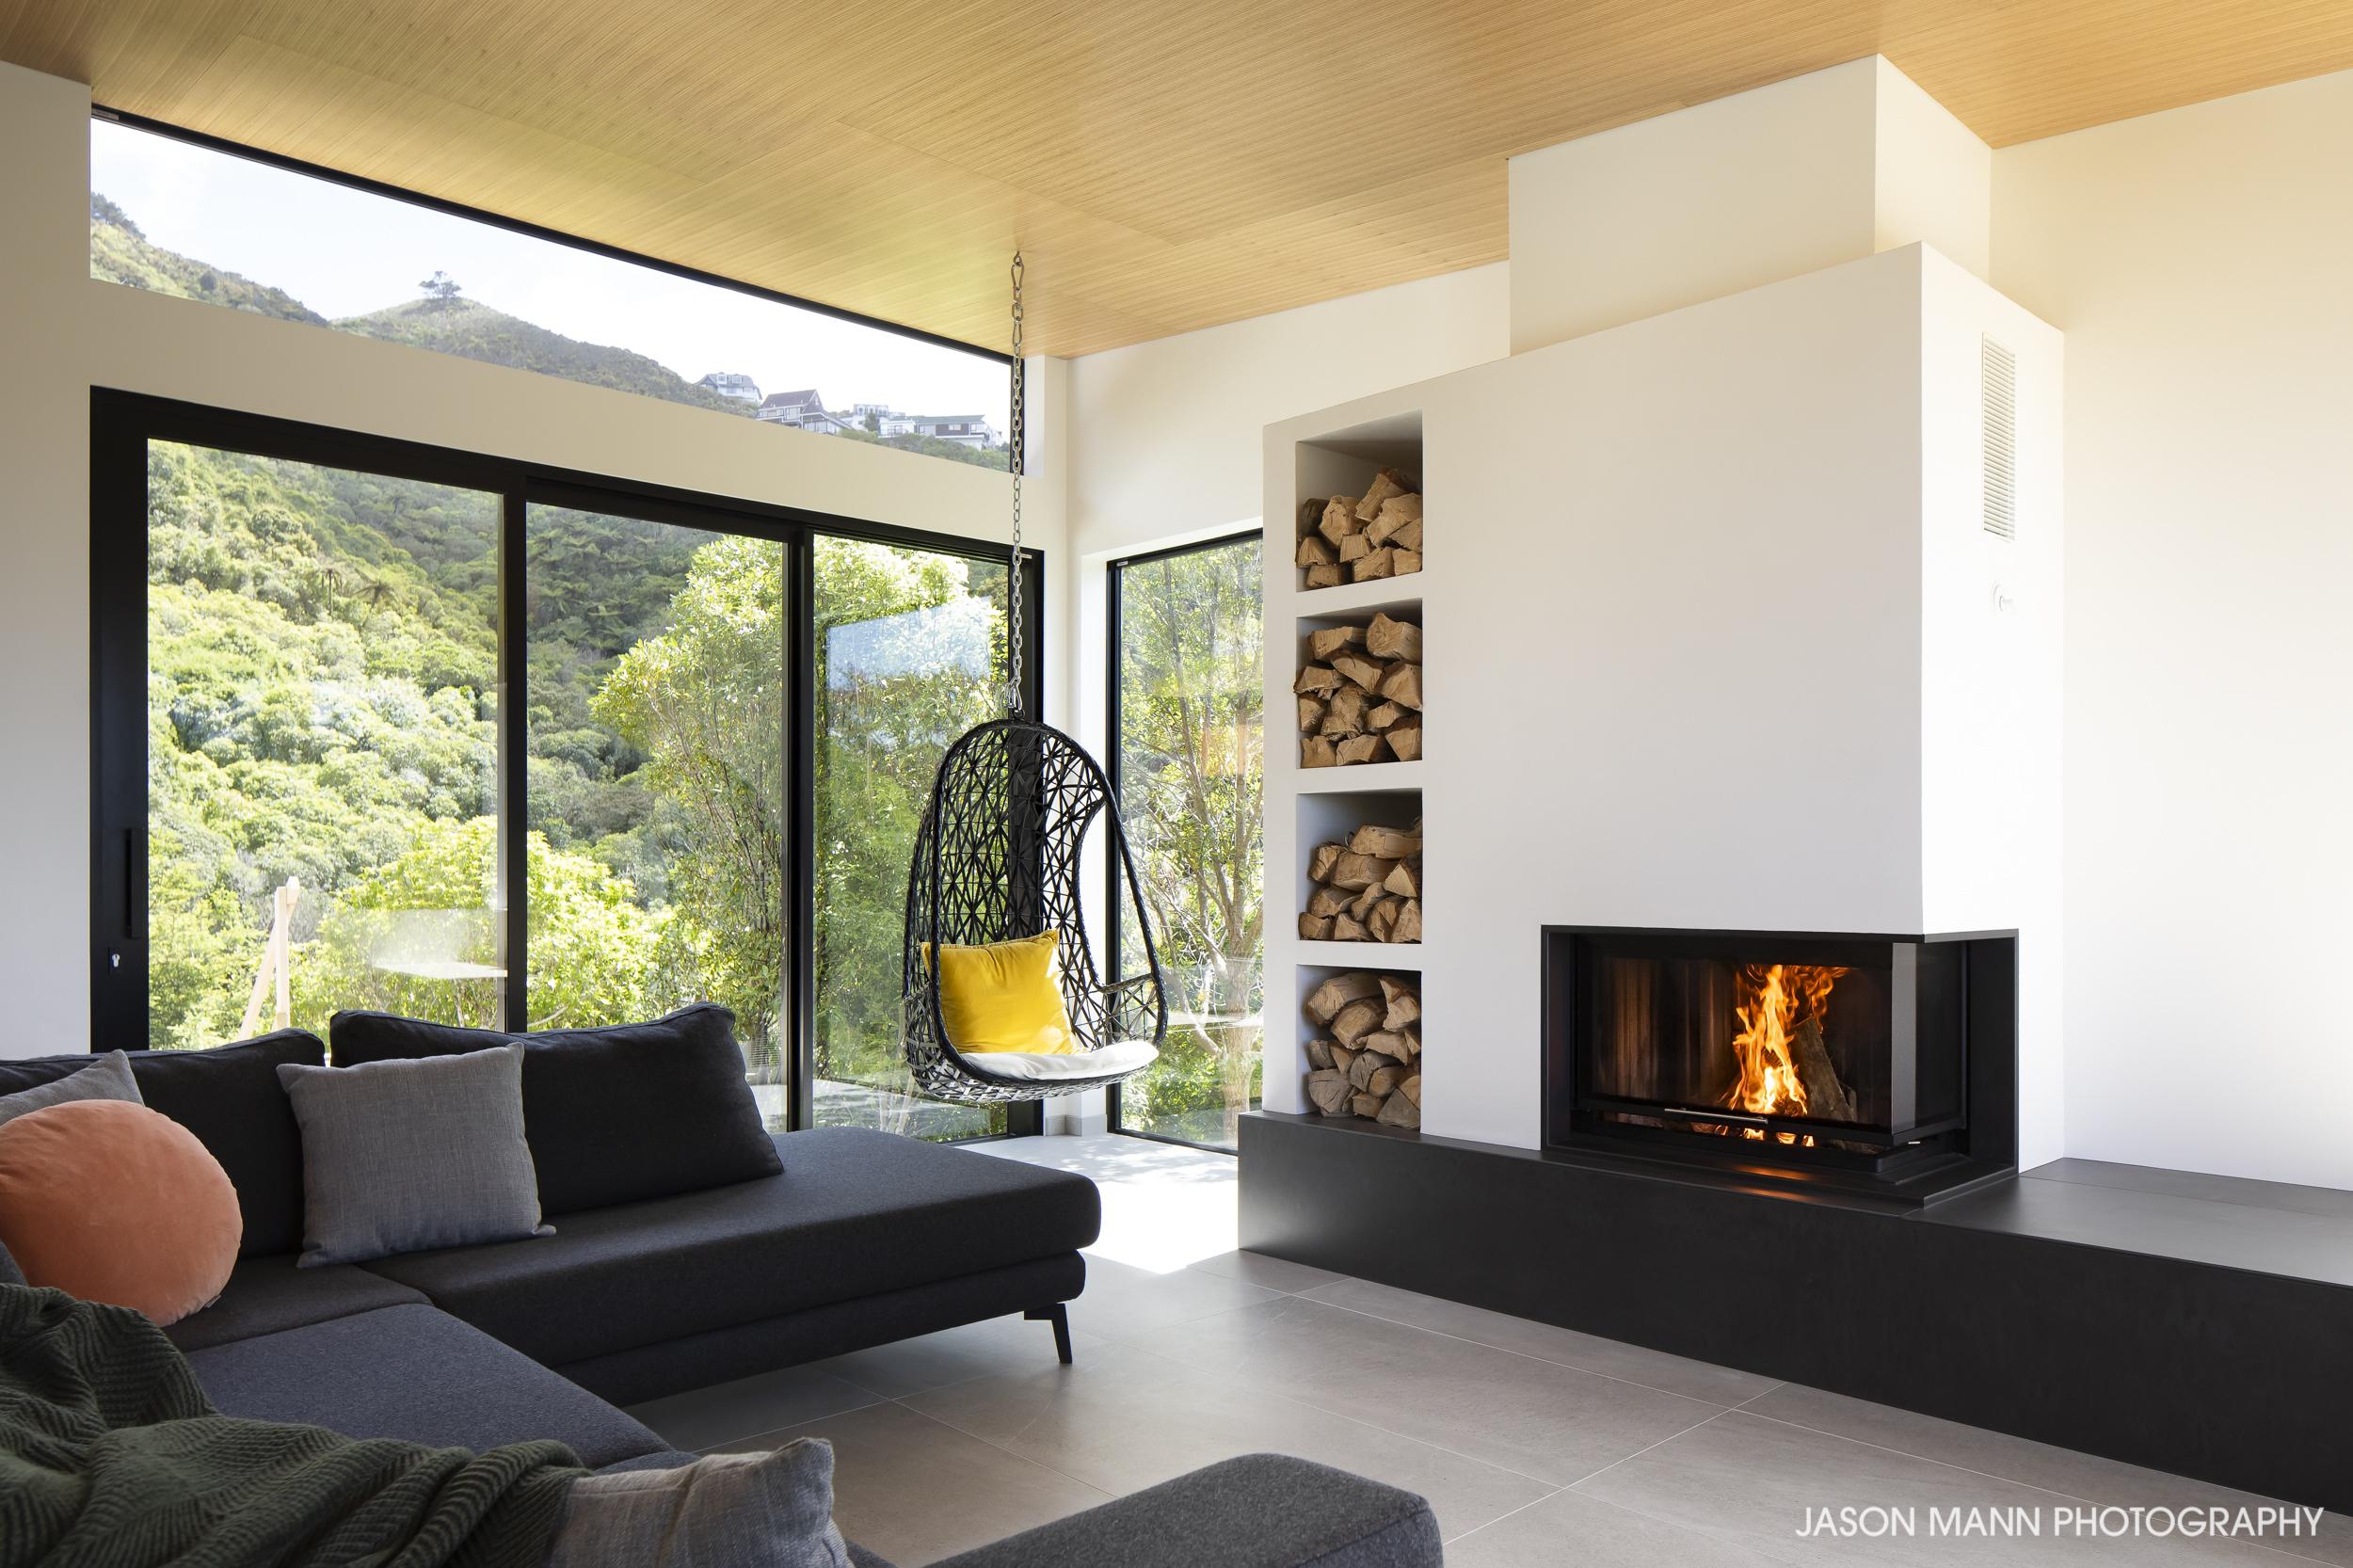 Jason_Mann_Fireplaces_07.jpg